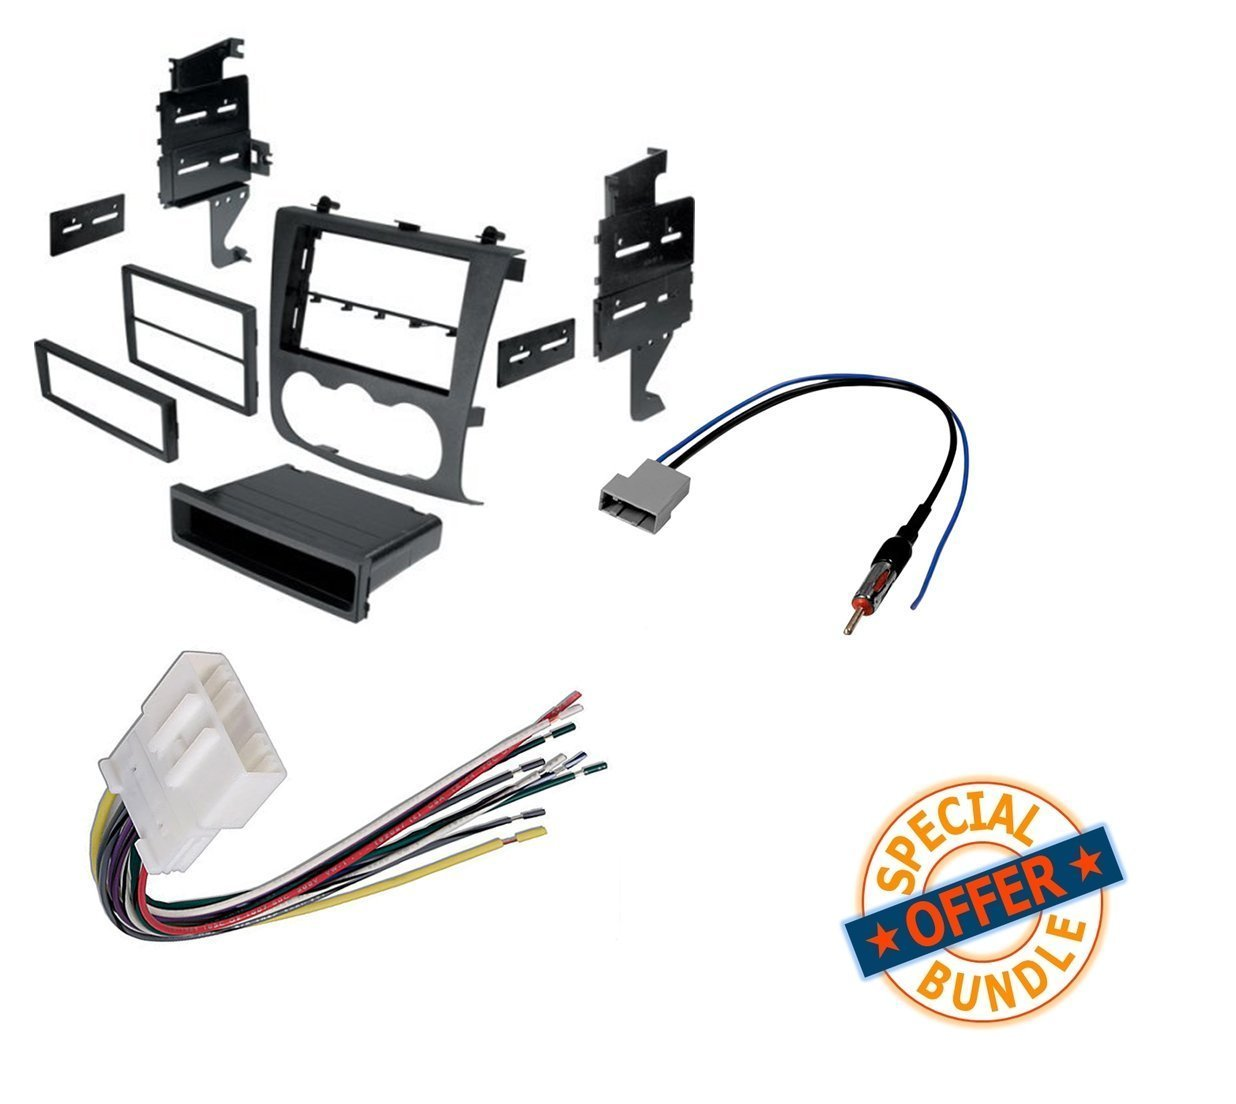 hight resolution of nissan altima 2007 2011 double din radio stereo installation dash kit wire harness and antenna adatper walmart com